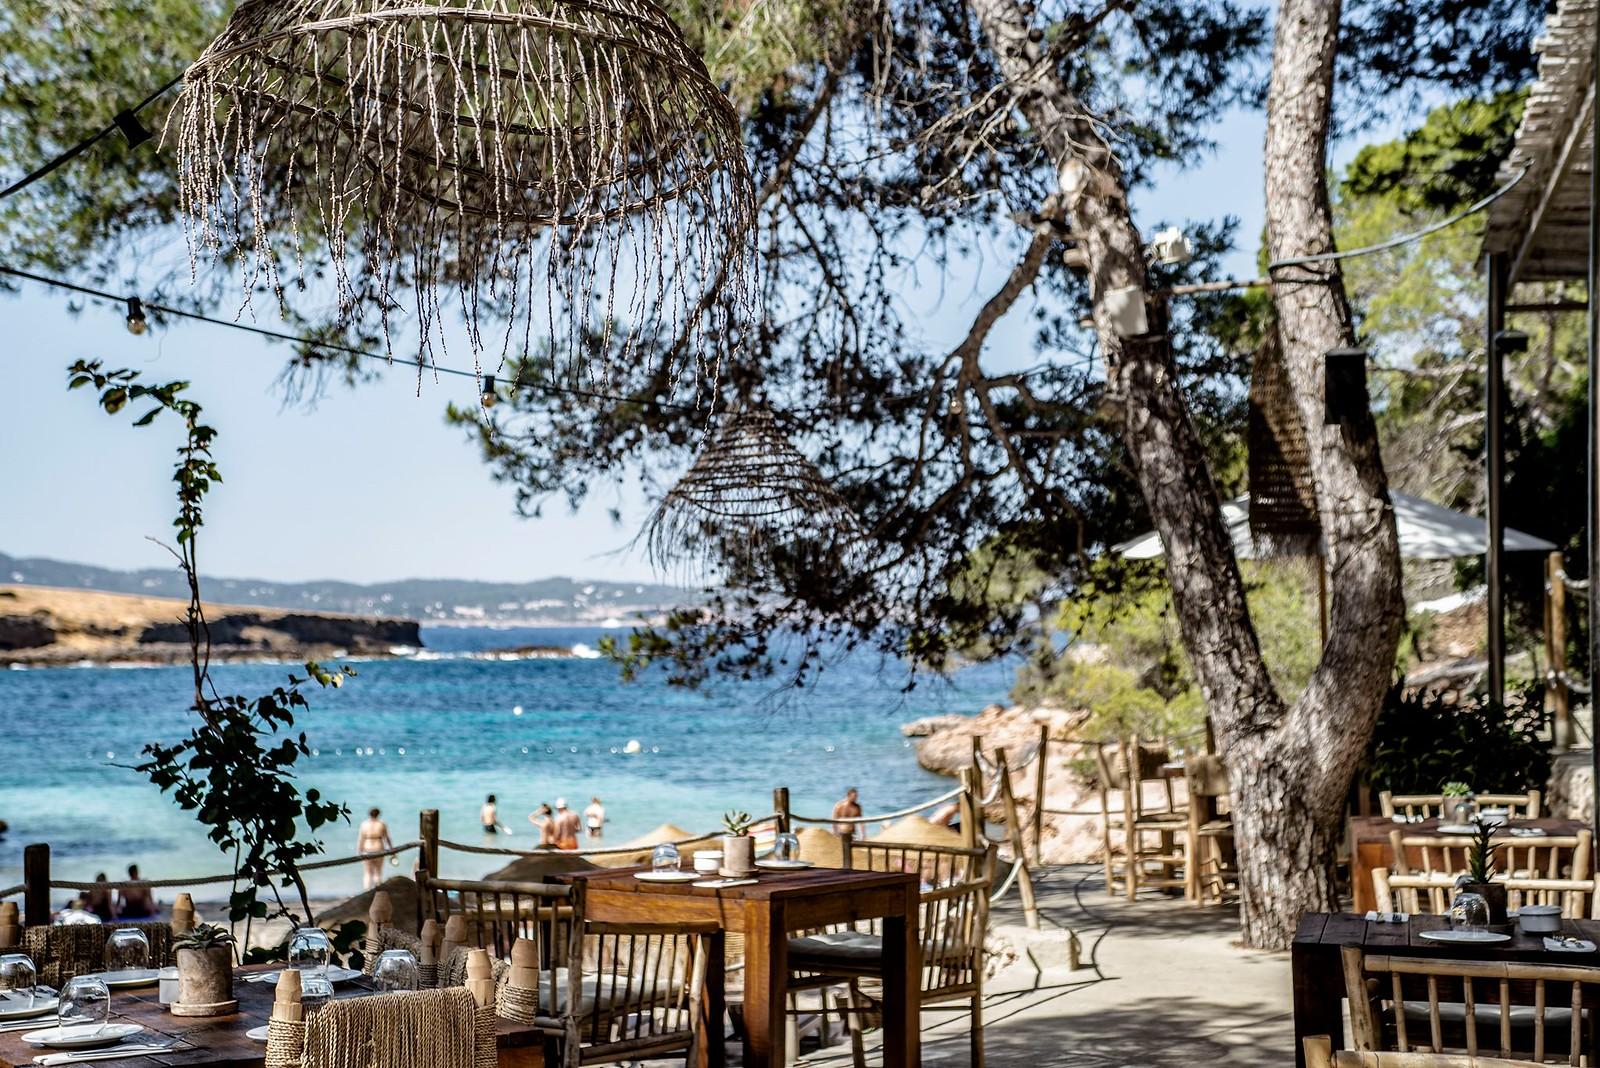 https://www.white-ibiza.com/wp-content/uploads/2020/09/white-ibiza-beach-restaurants-cala-gracioneta-chiringuito-11.jpg